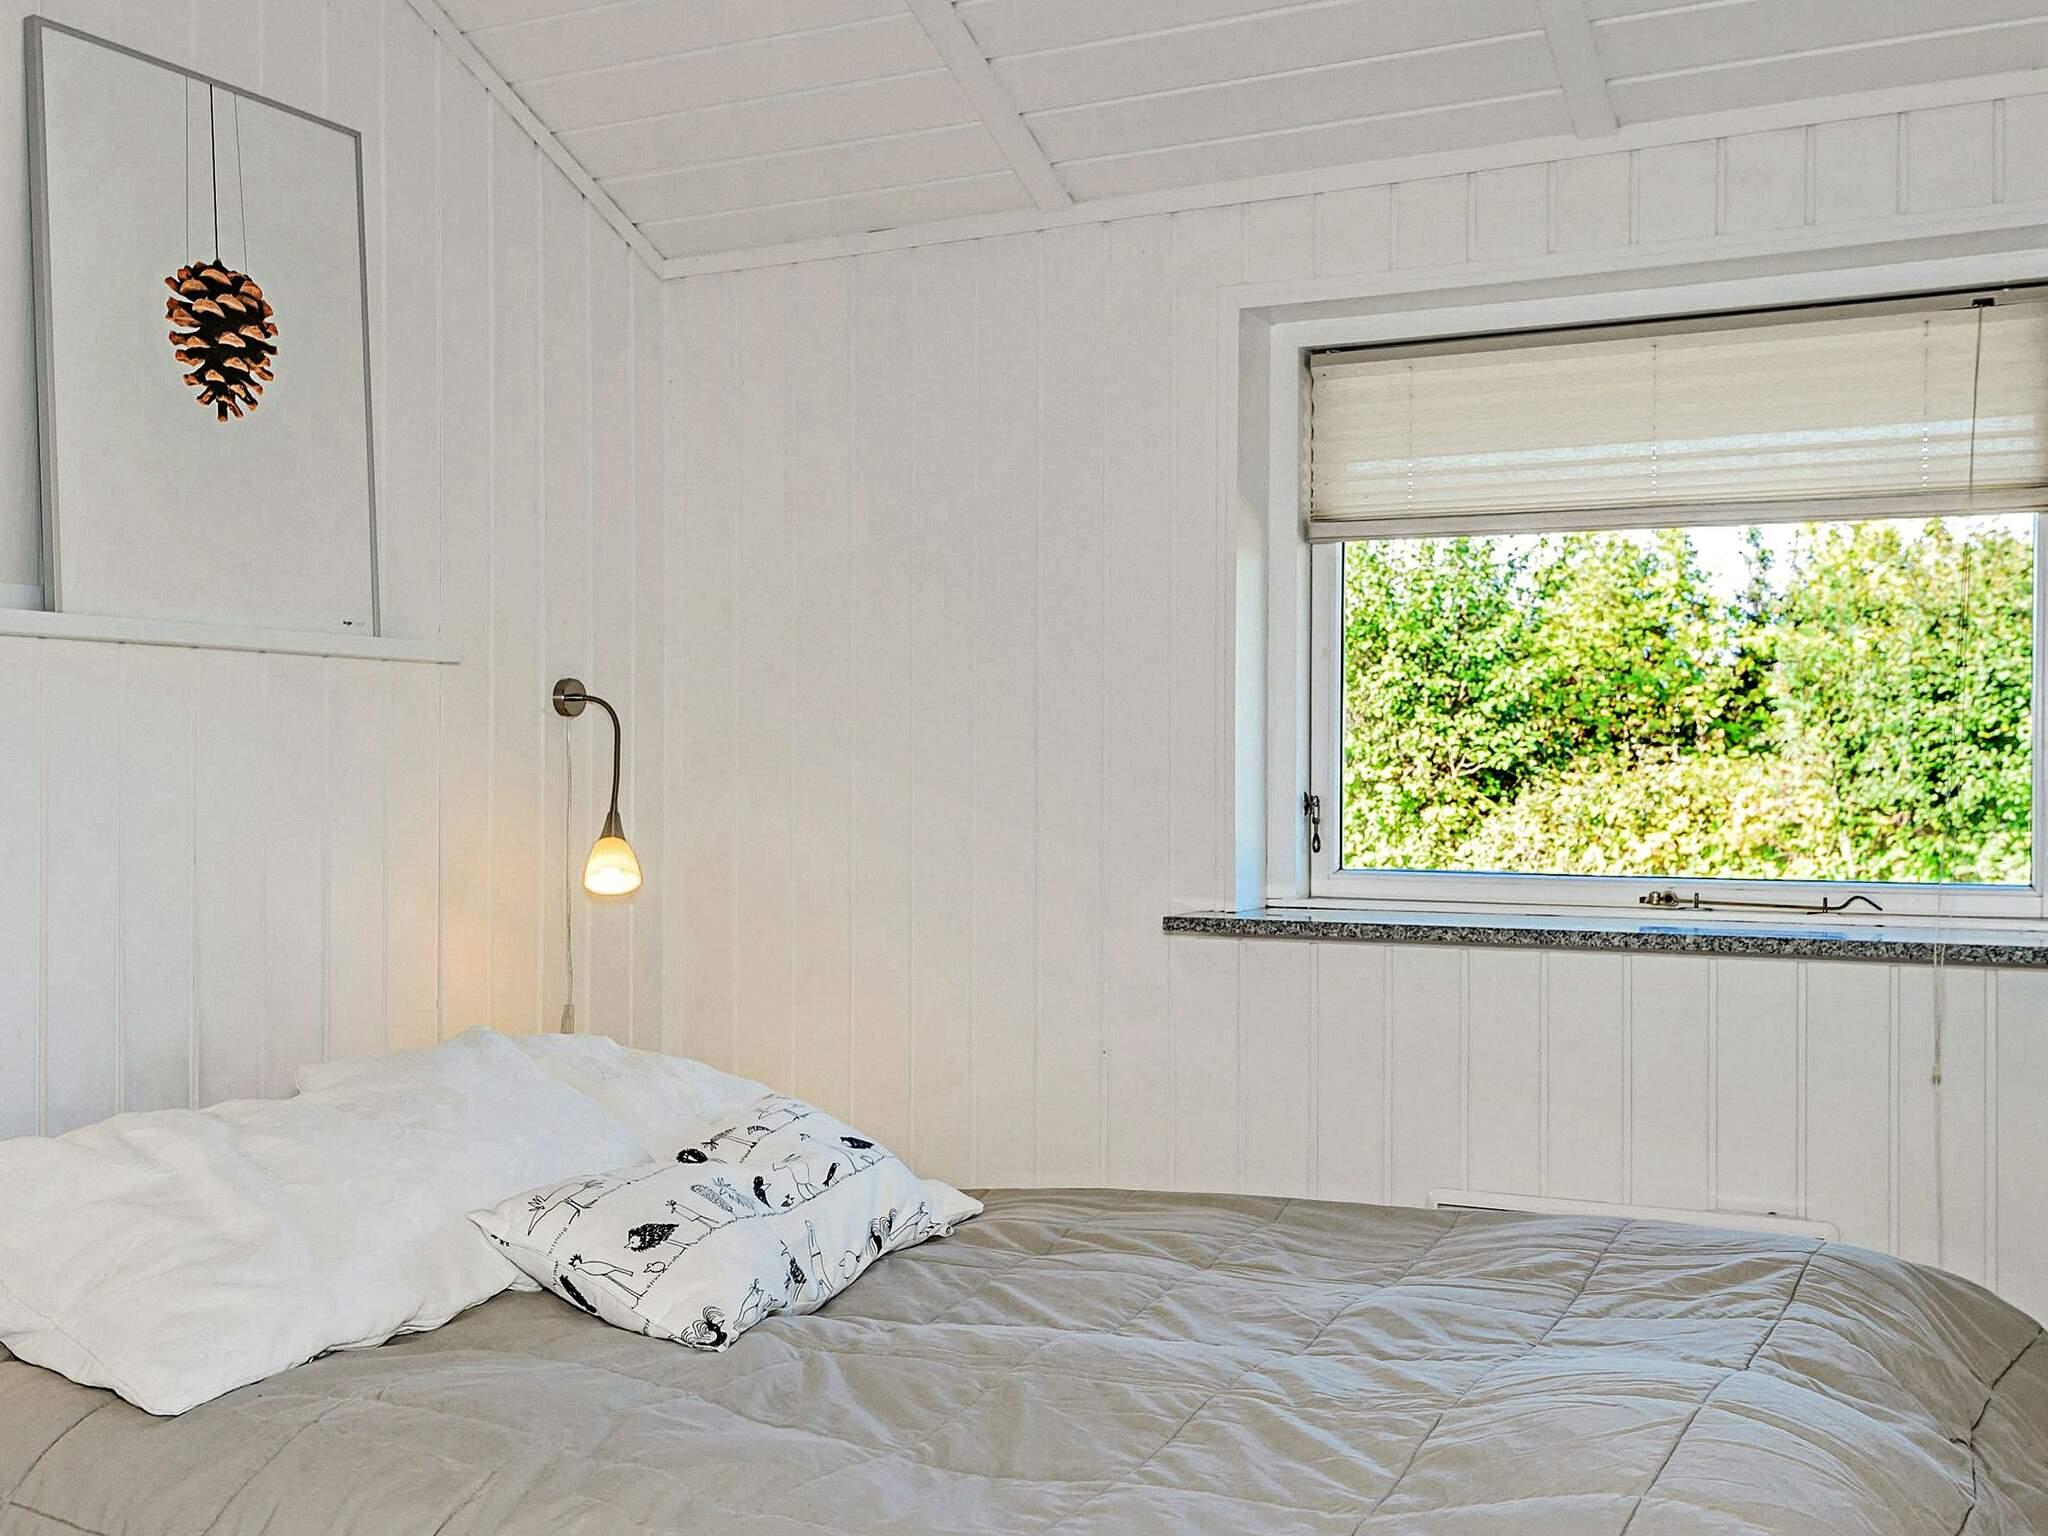 Ferienhaus Røsnæs (2780183), Kalundborg, , Westseeland, Dänemark, Bild 15